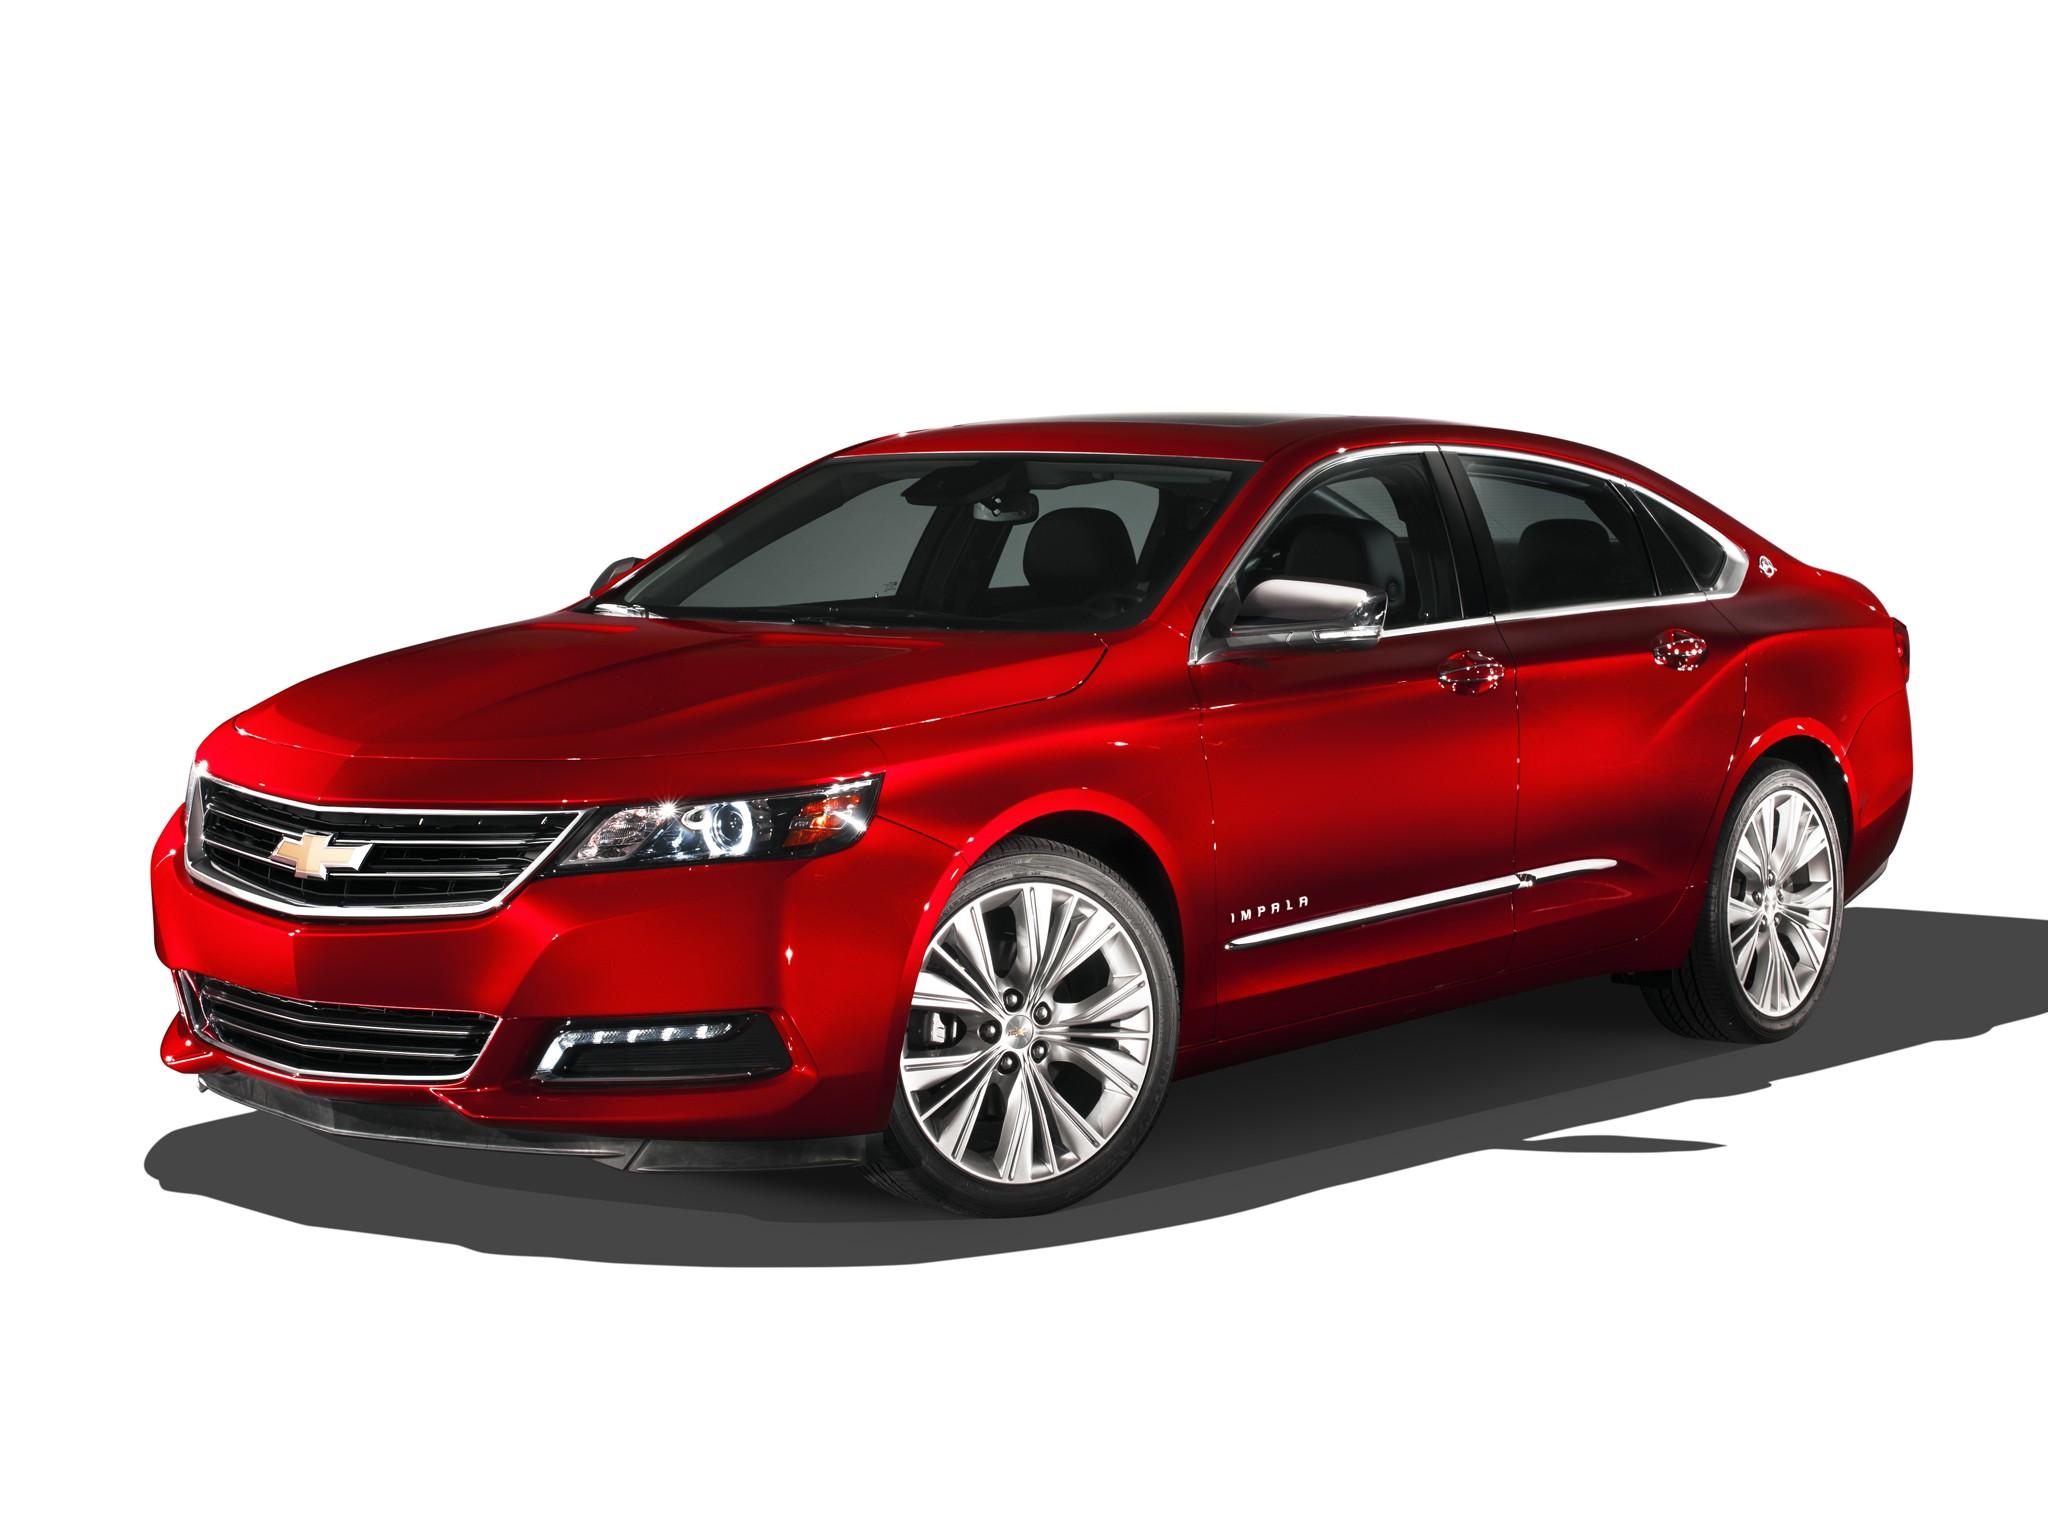 2013 Chevrolet Impala Concept